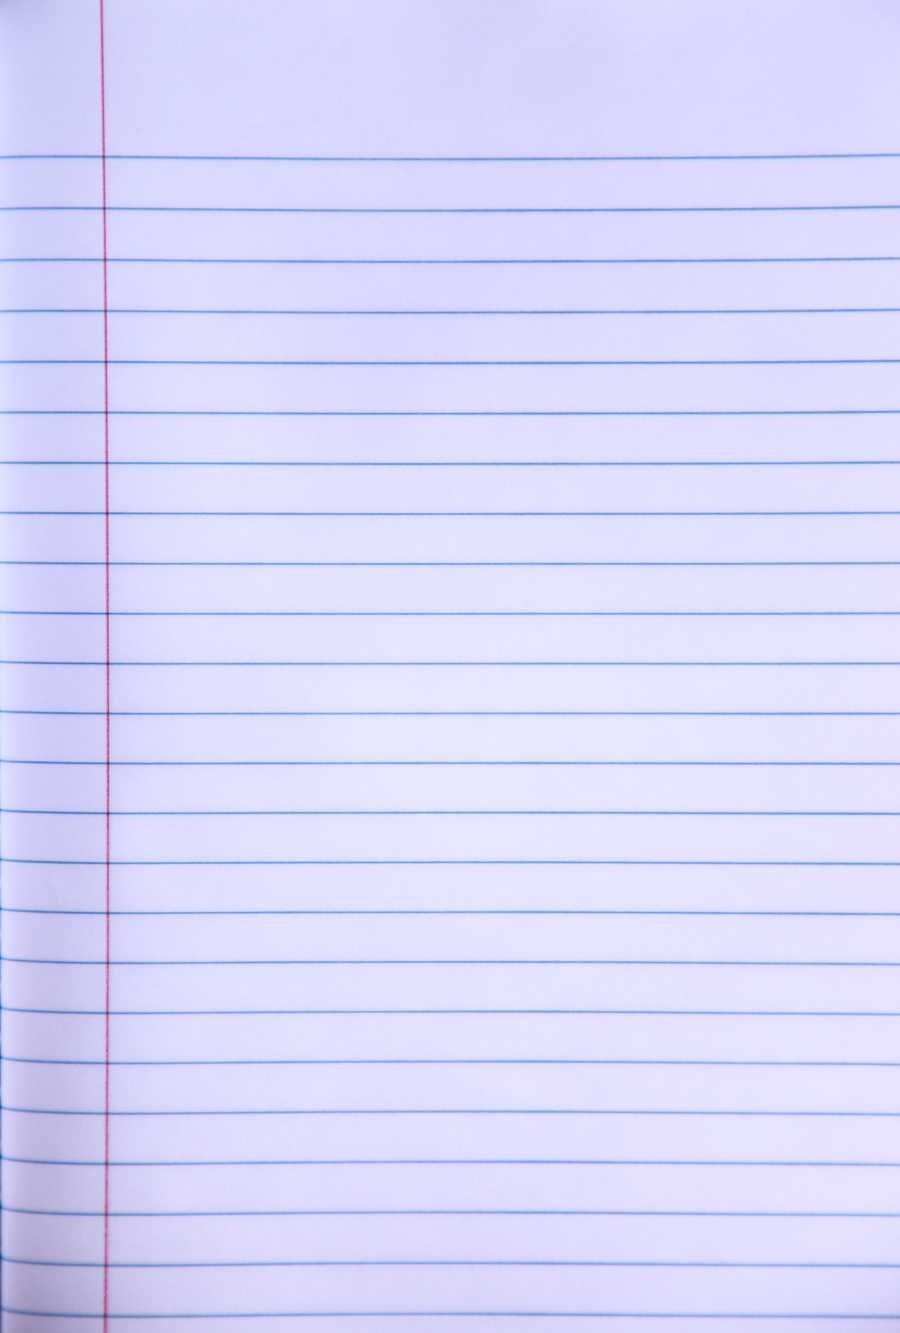 Loose Leaf Ruled Notebook Paper